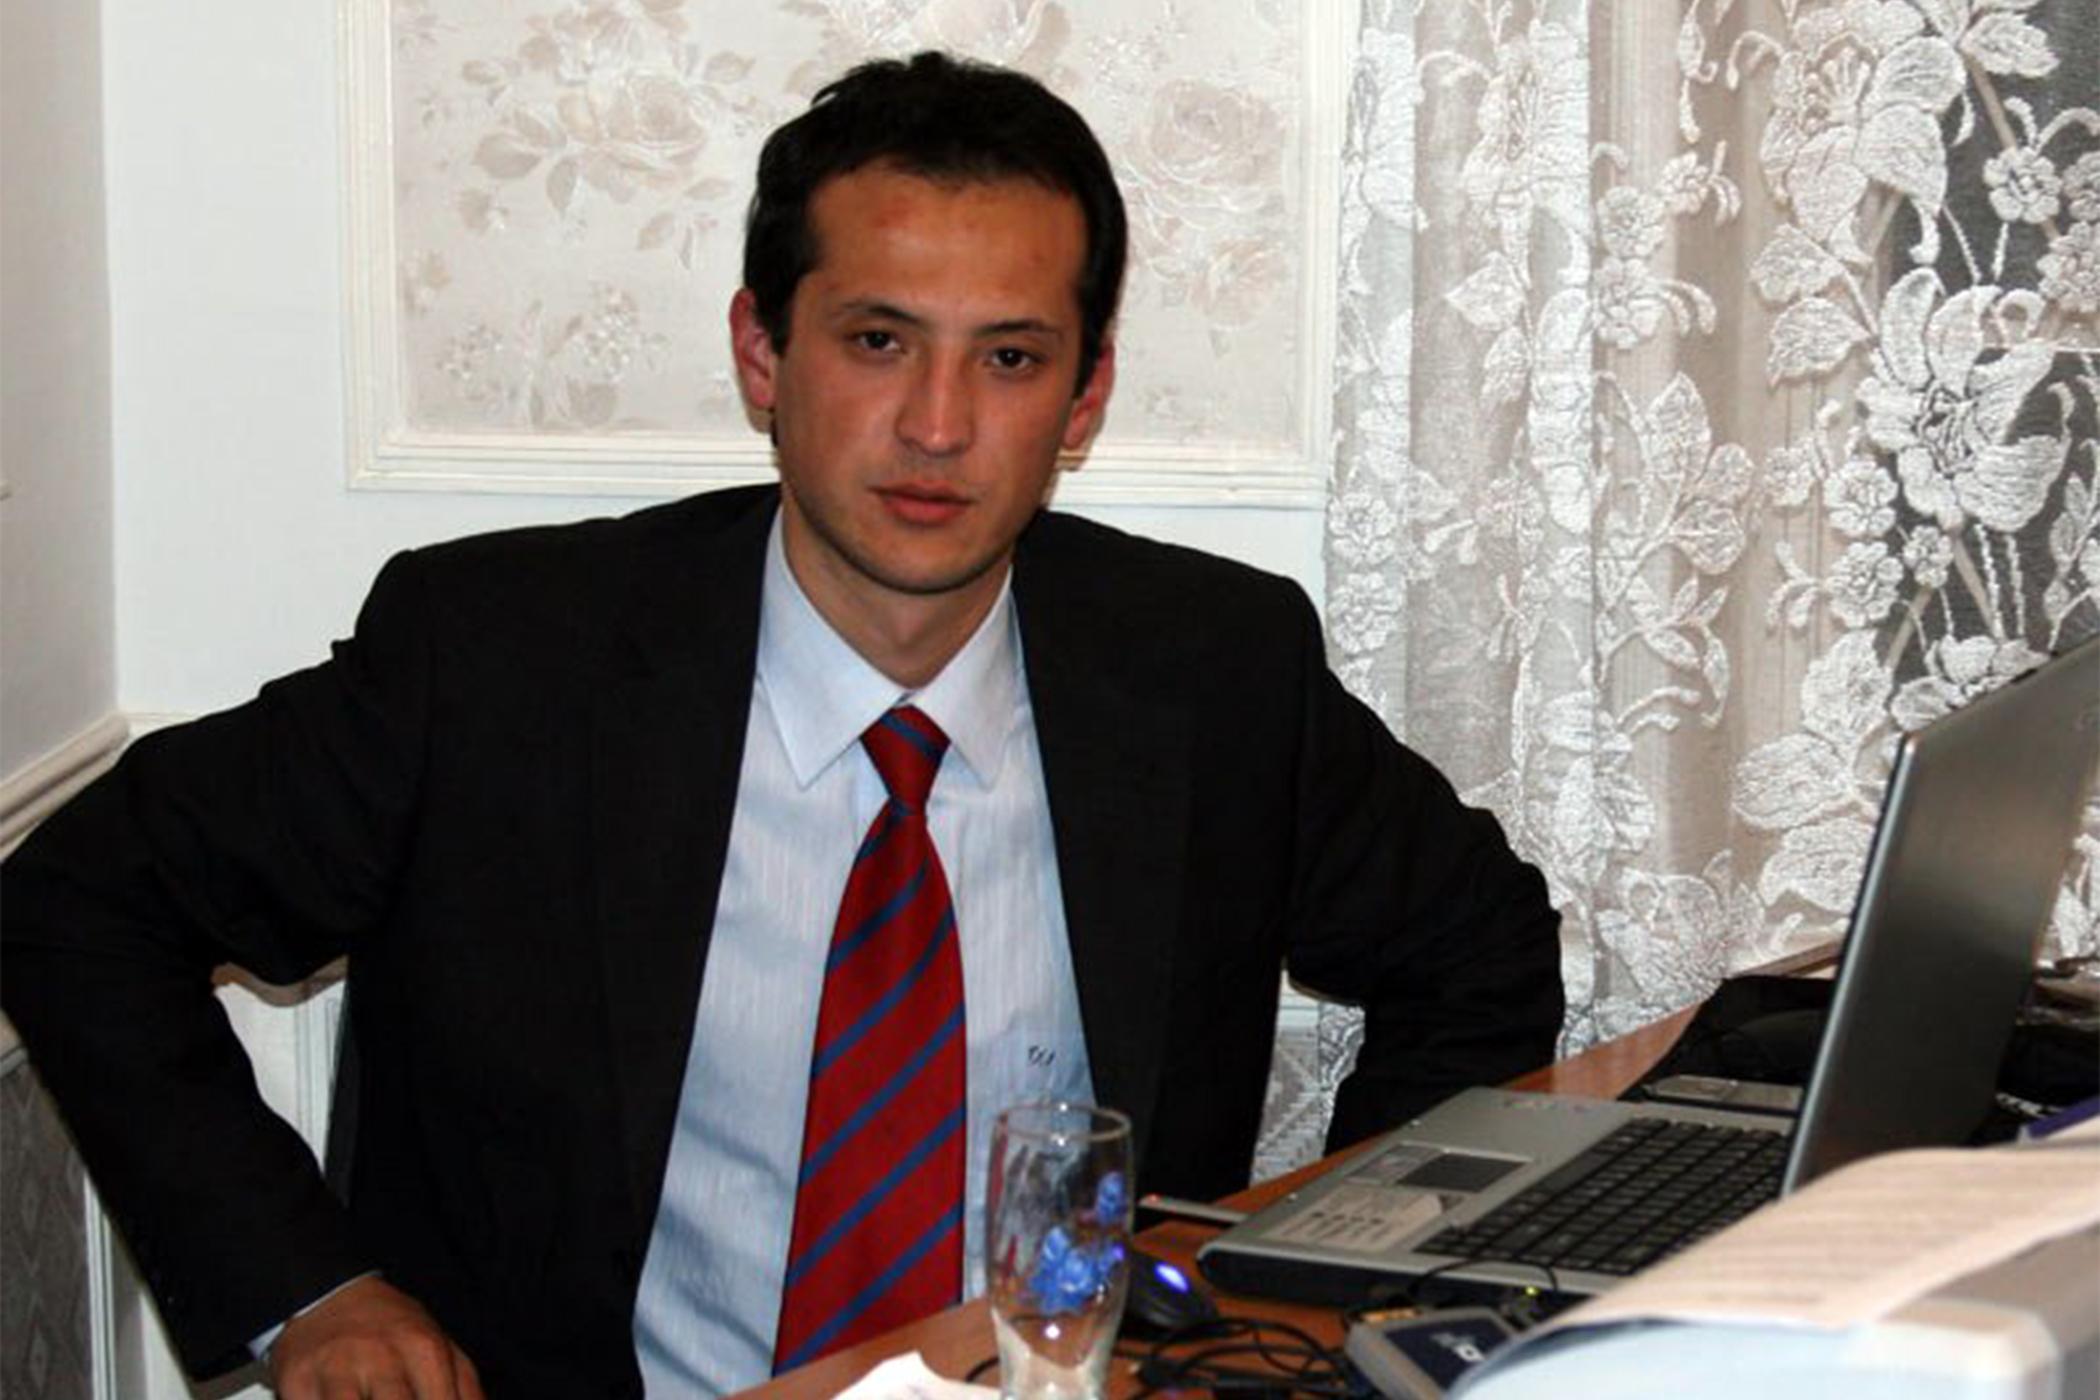 Uzbek journalist Saipov commemorated in Osh 10 years after murder